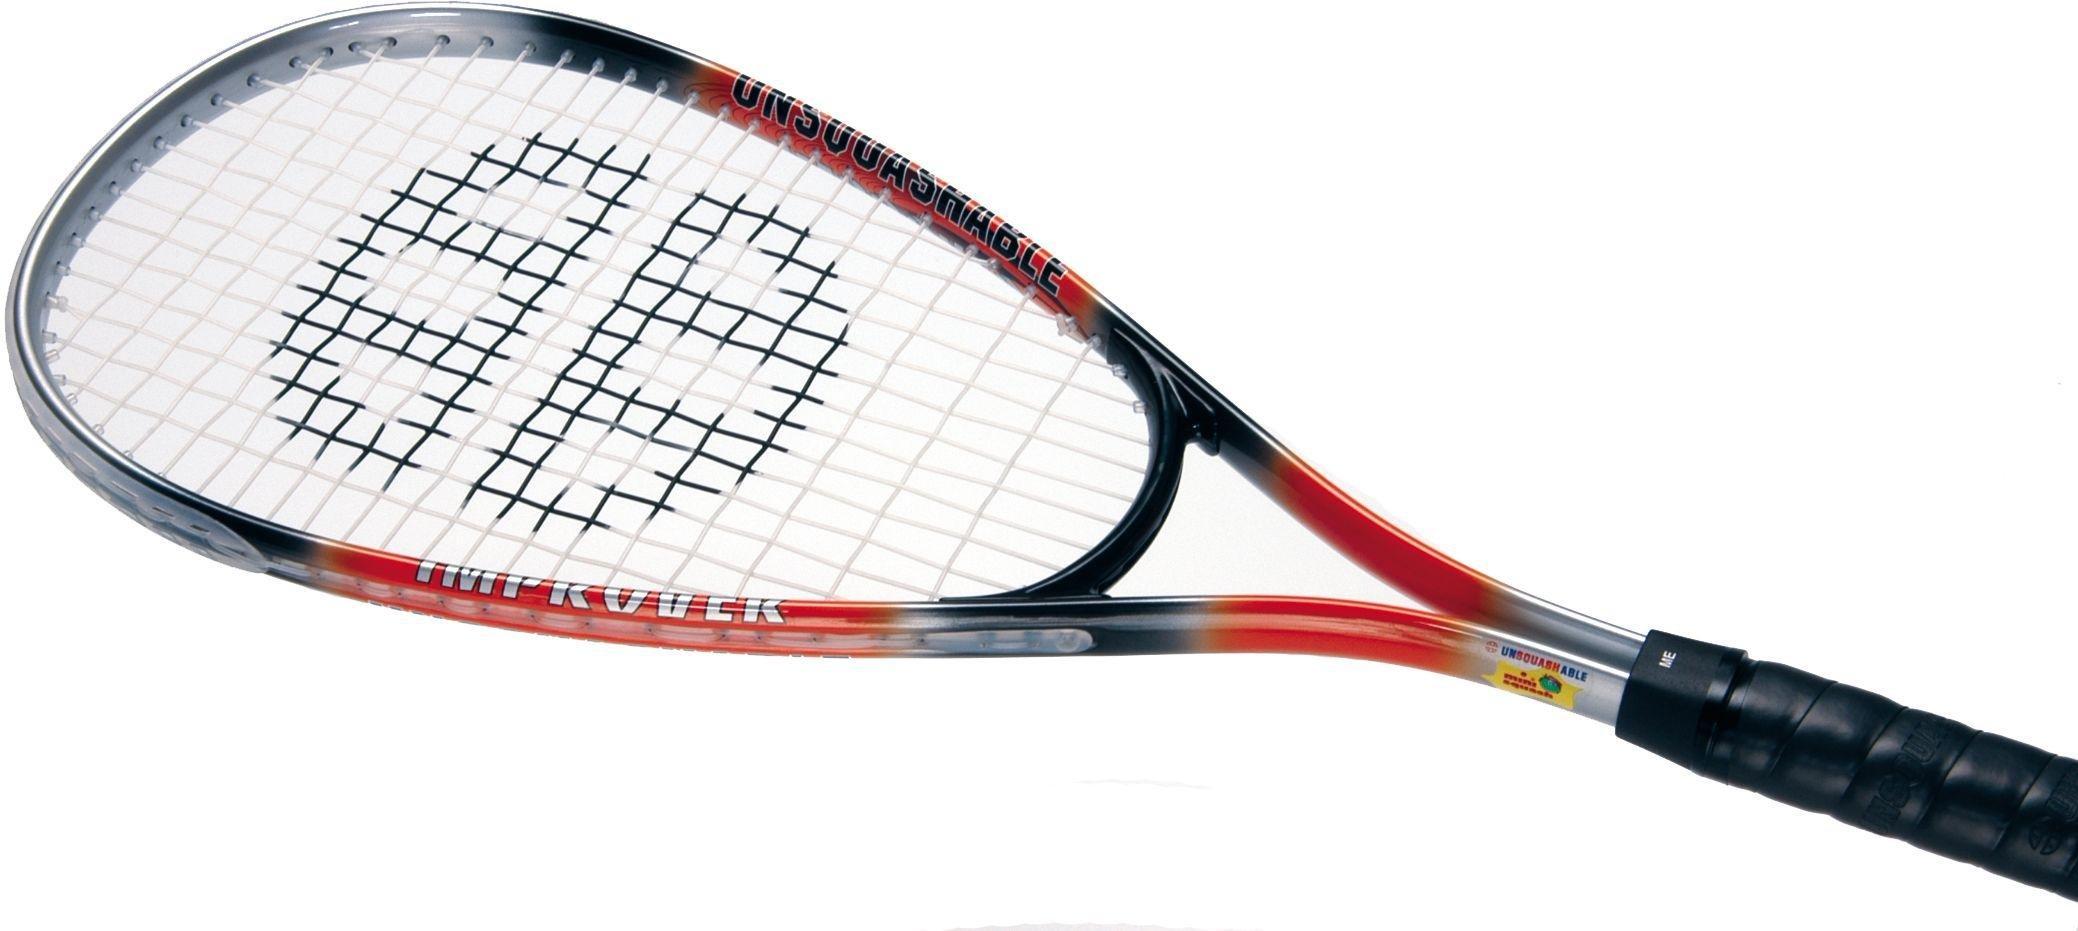 unsquashable-improver-squash-racket